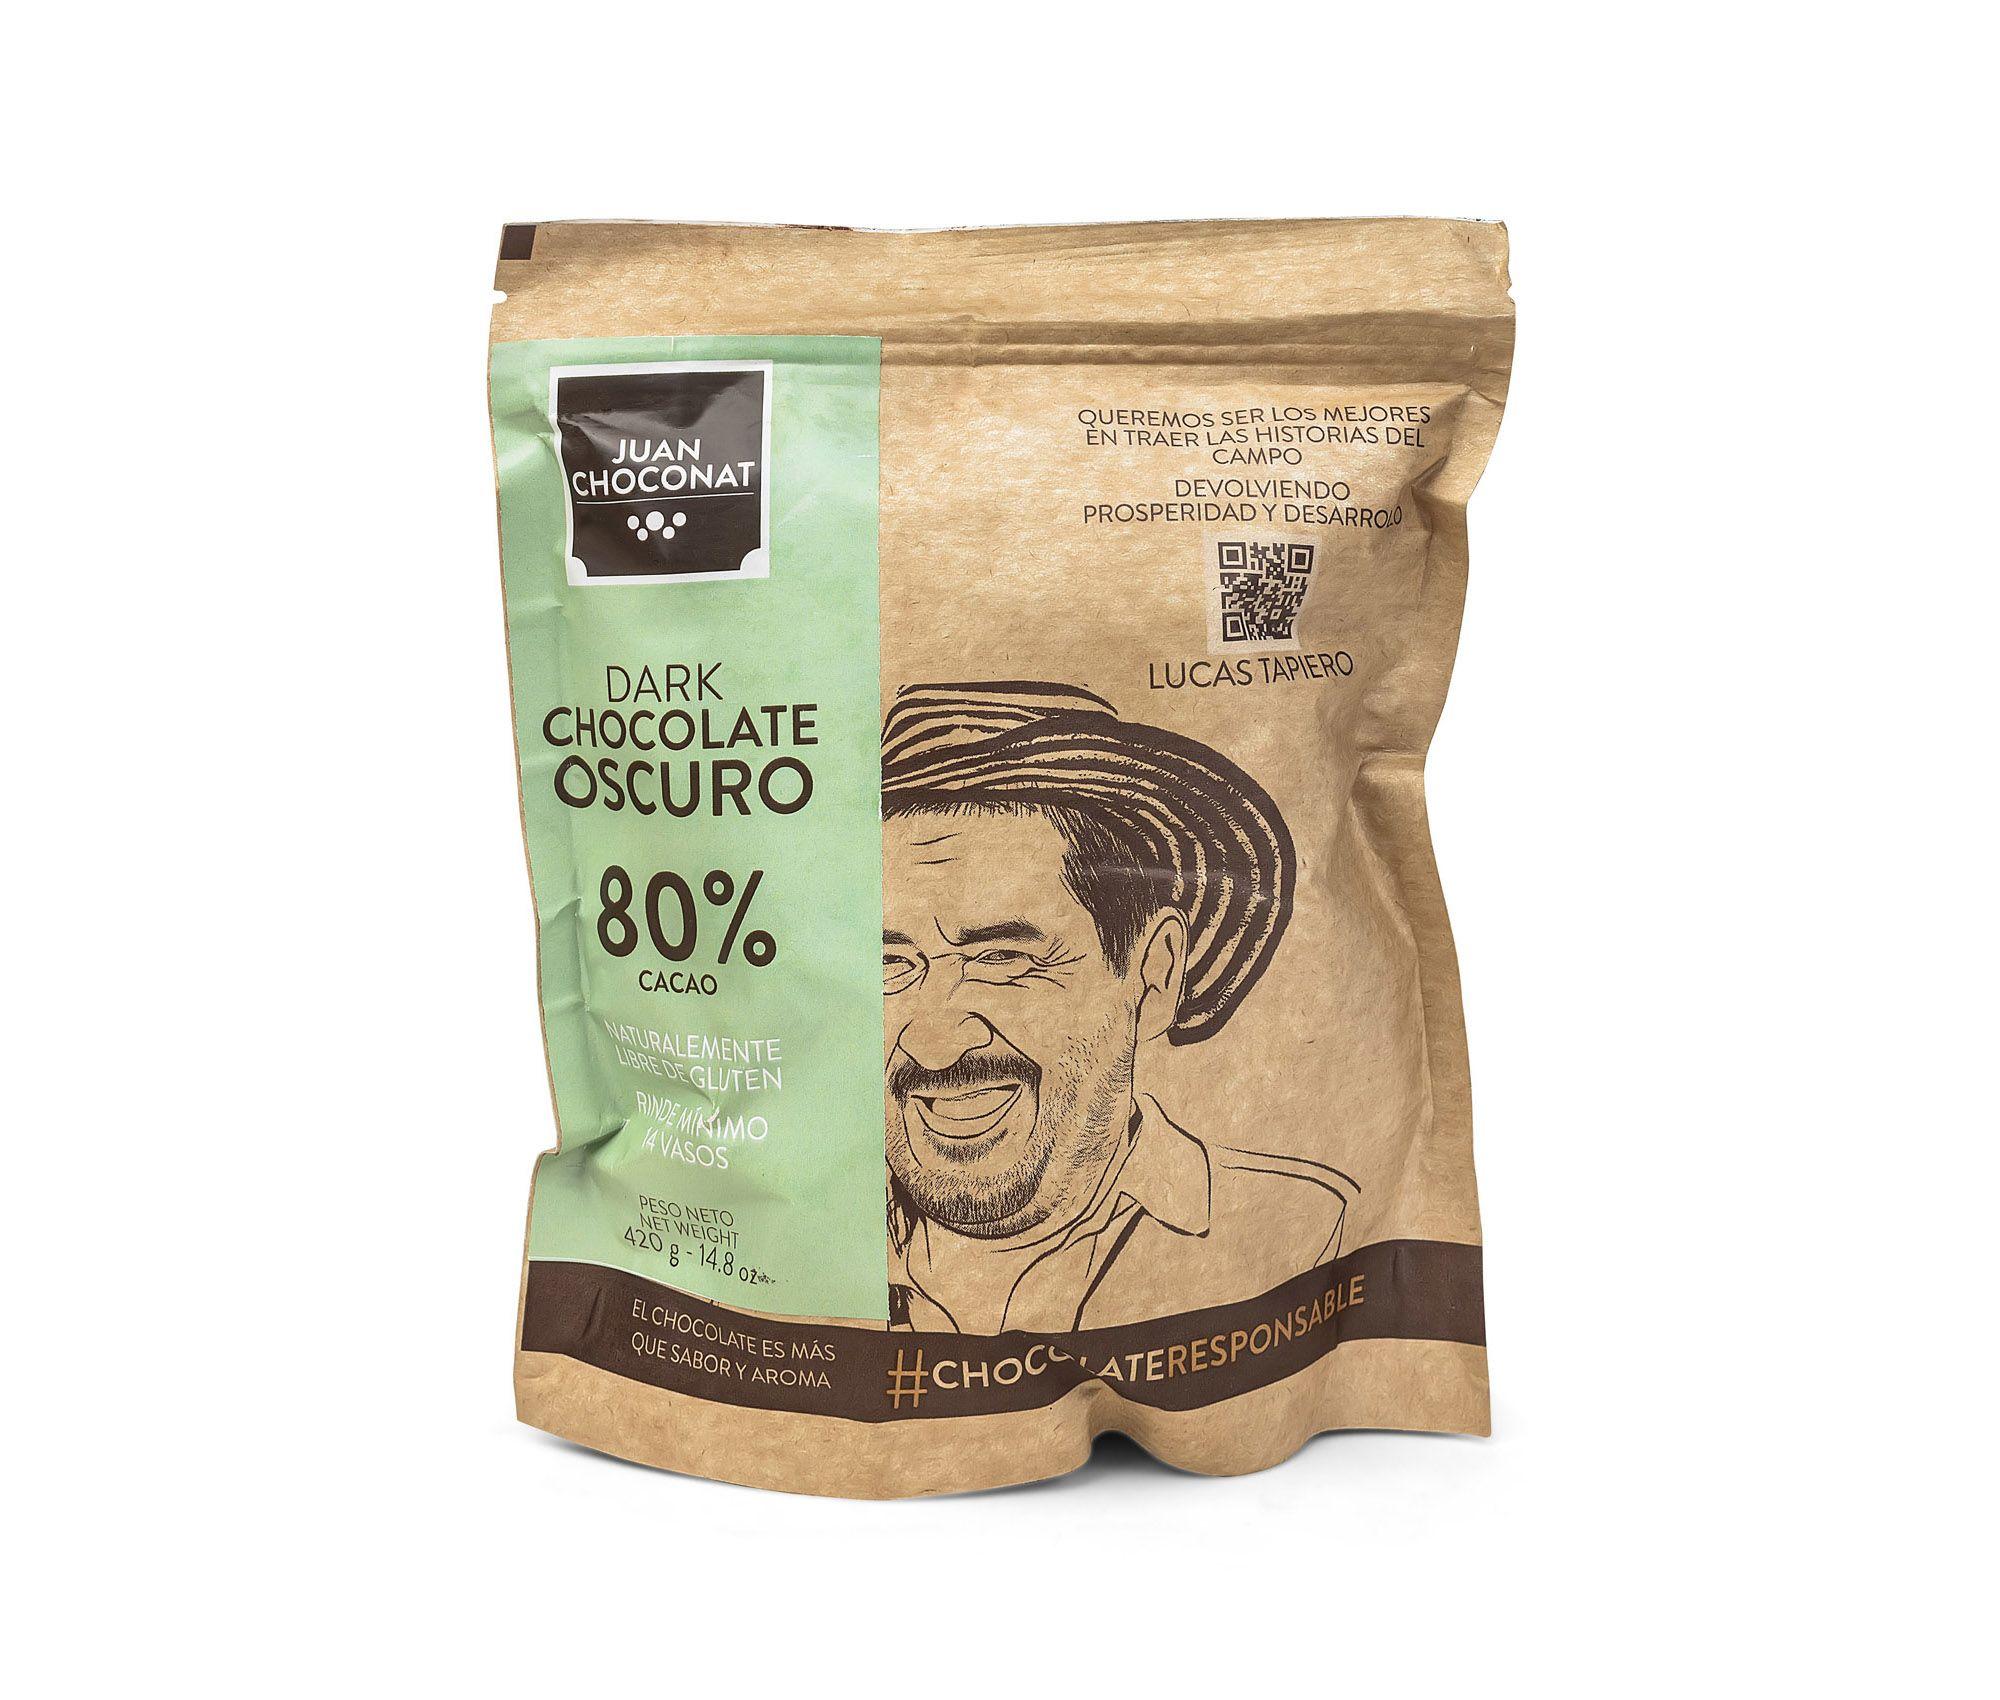 Choconat-80% cacao 420 gramos